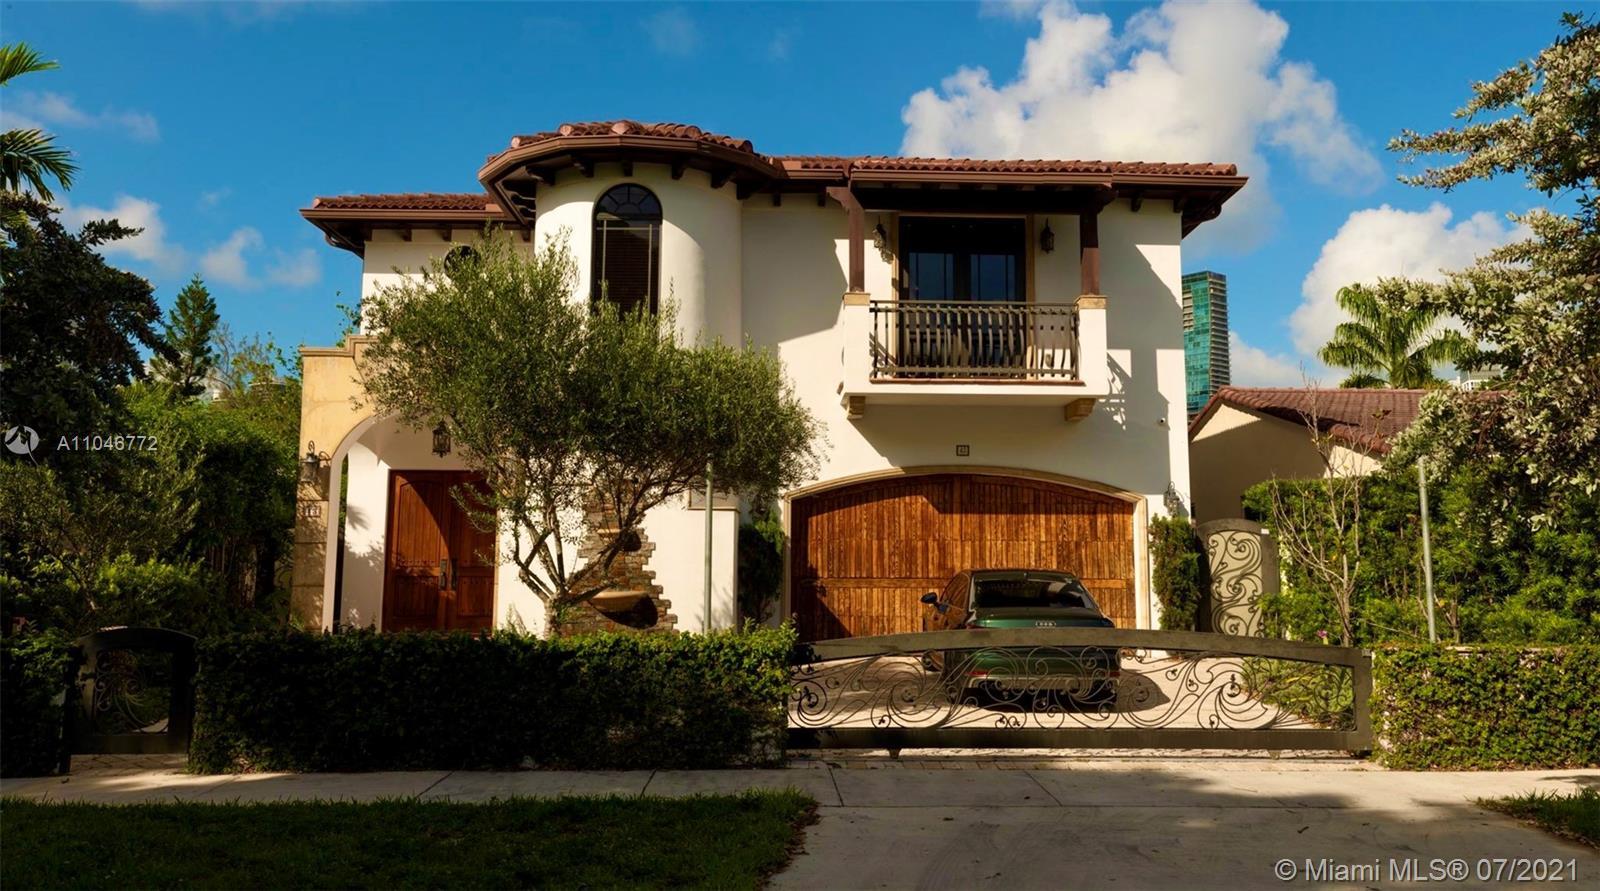 Holleman Park - 43 SW 20th Rd, Miami, FL 33129